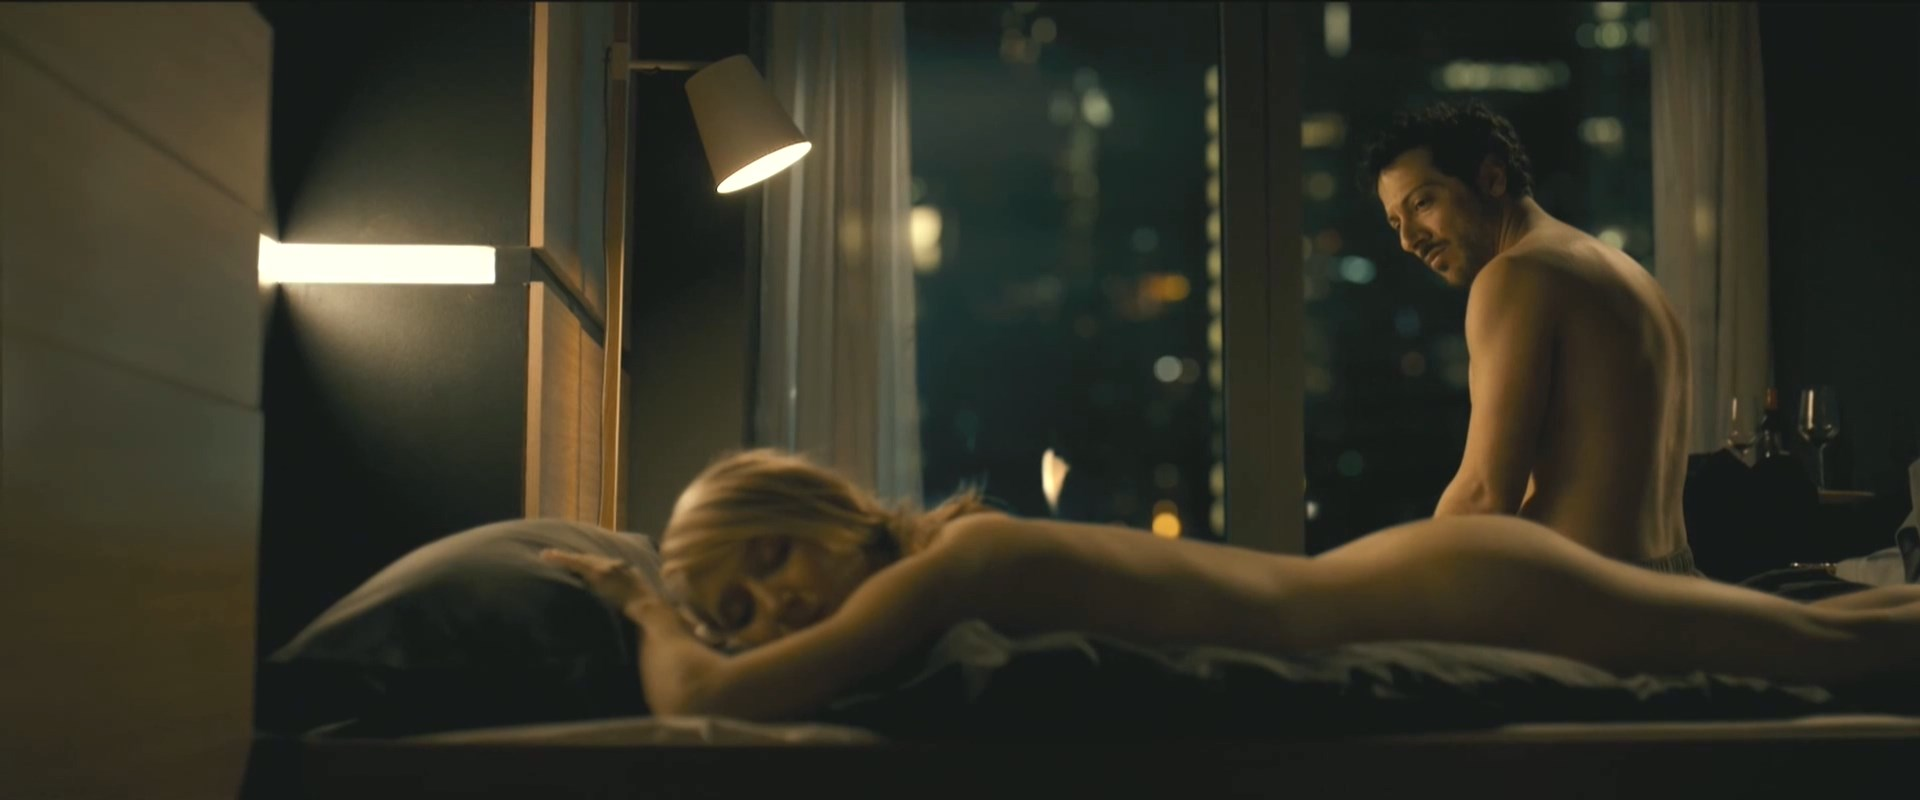 Anna maria mühe porno